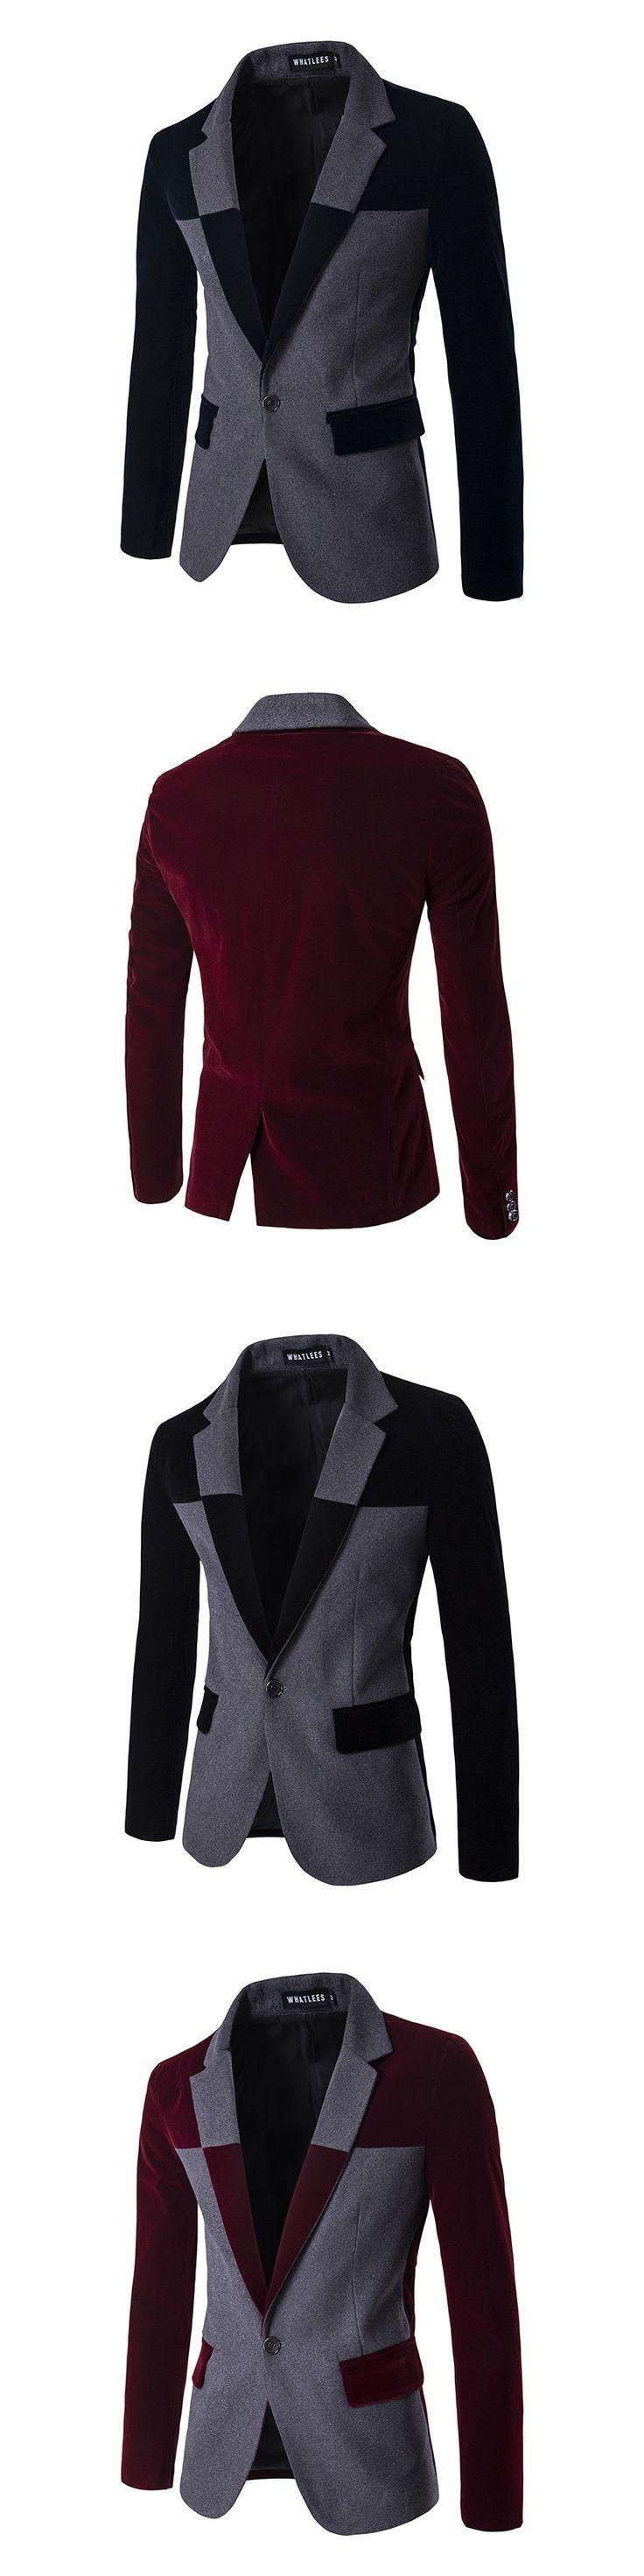 Mens Velvet Blazer 2017 New Arrival One Button Blazer Men Casual Slim Fit Stylish Mens Suit Jacket Costume Homme Wine Red XXL